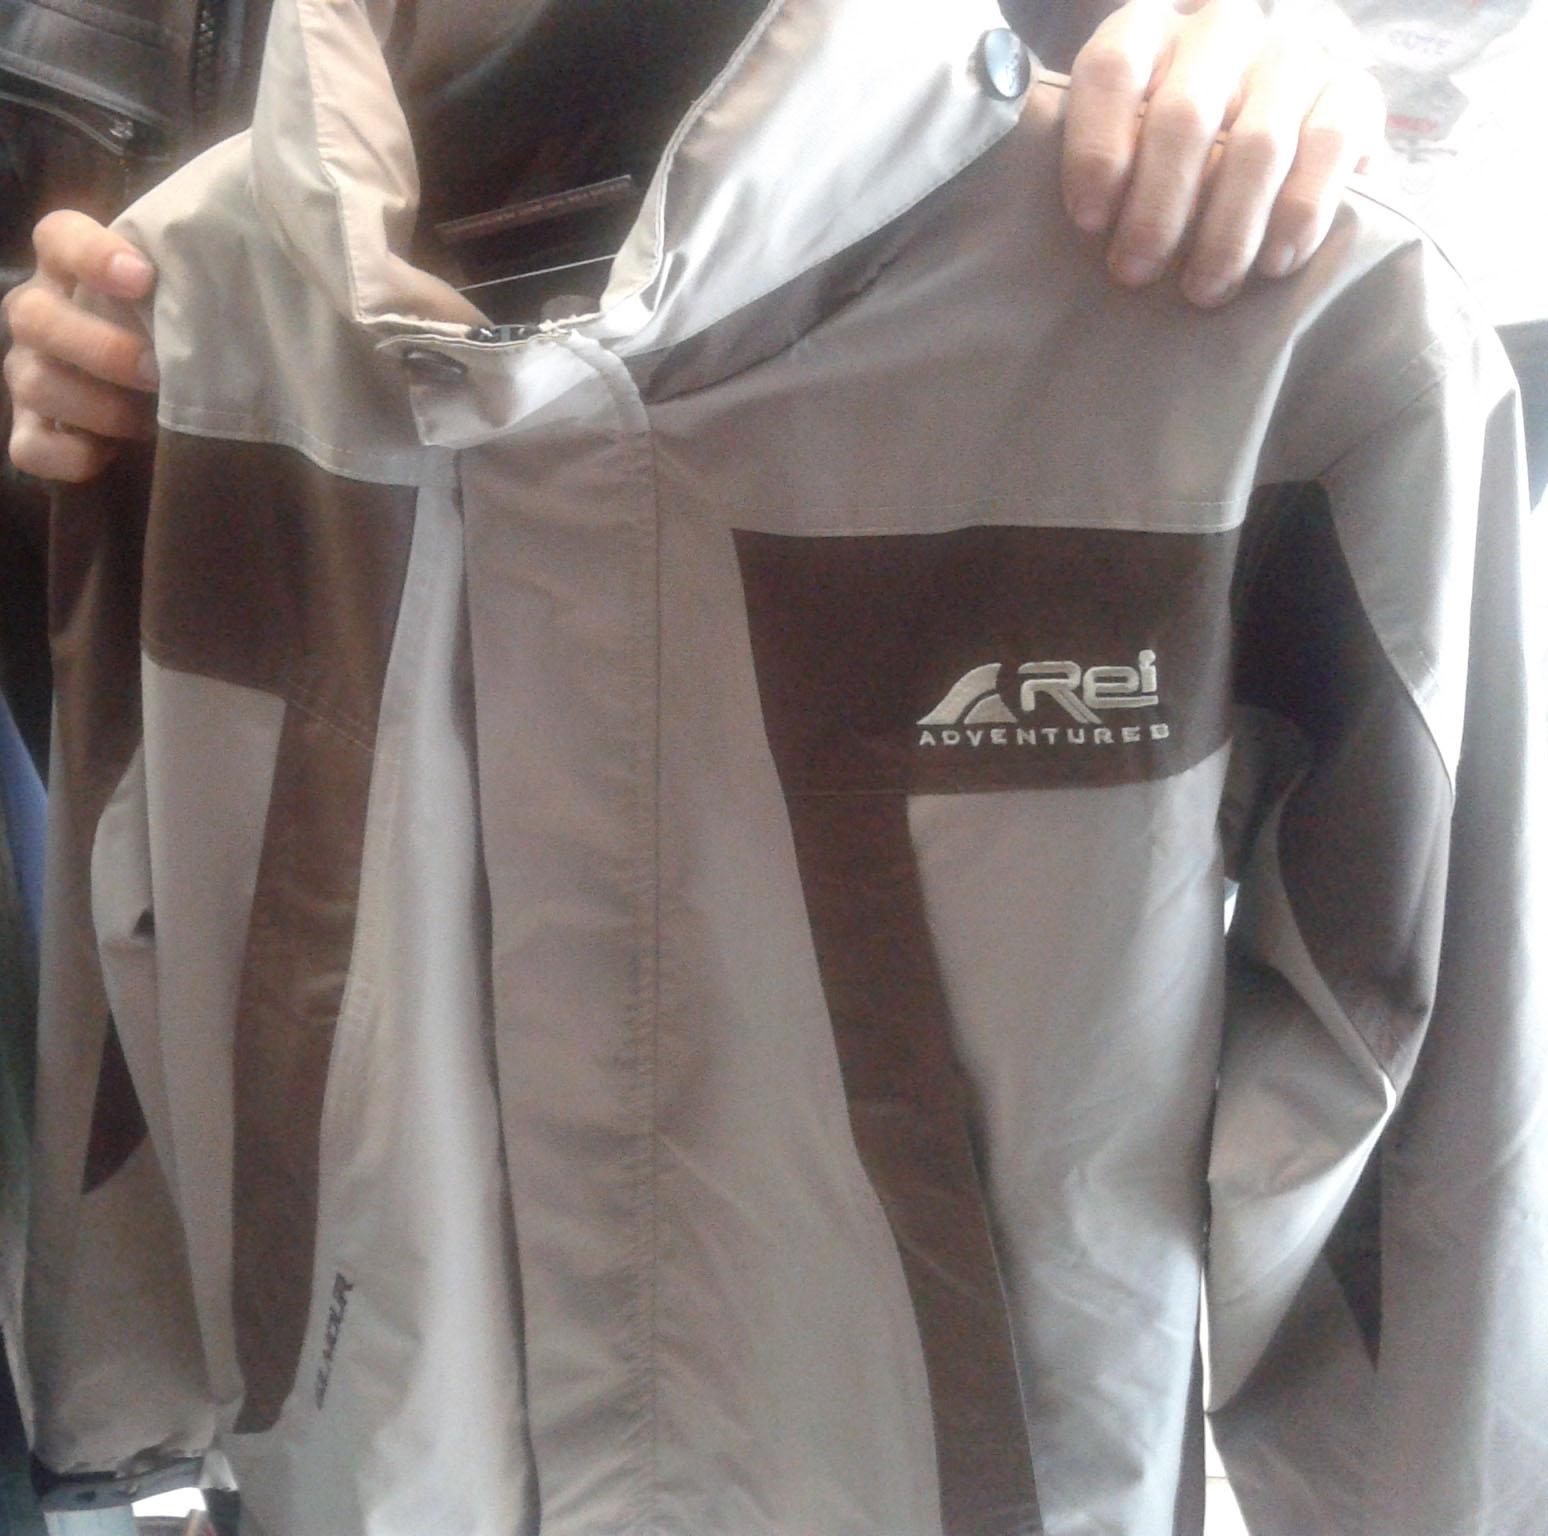 harga jaket REI, indonesia, merek, produk, tipe